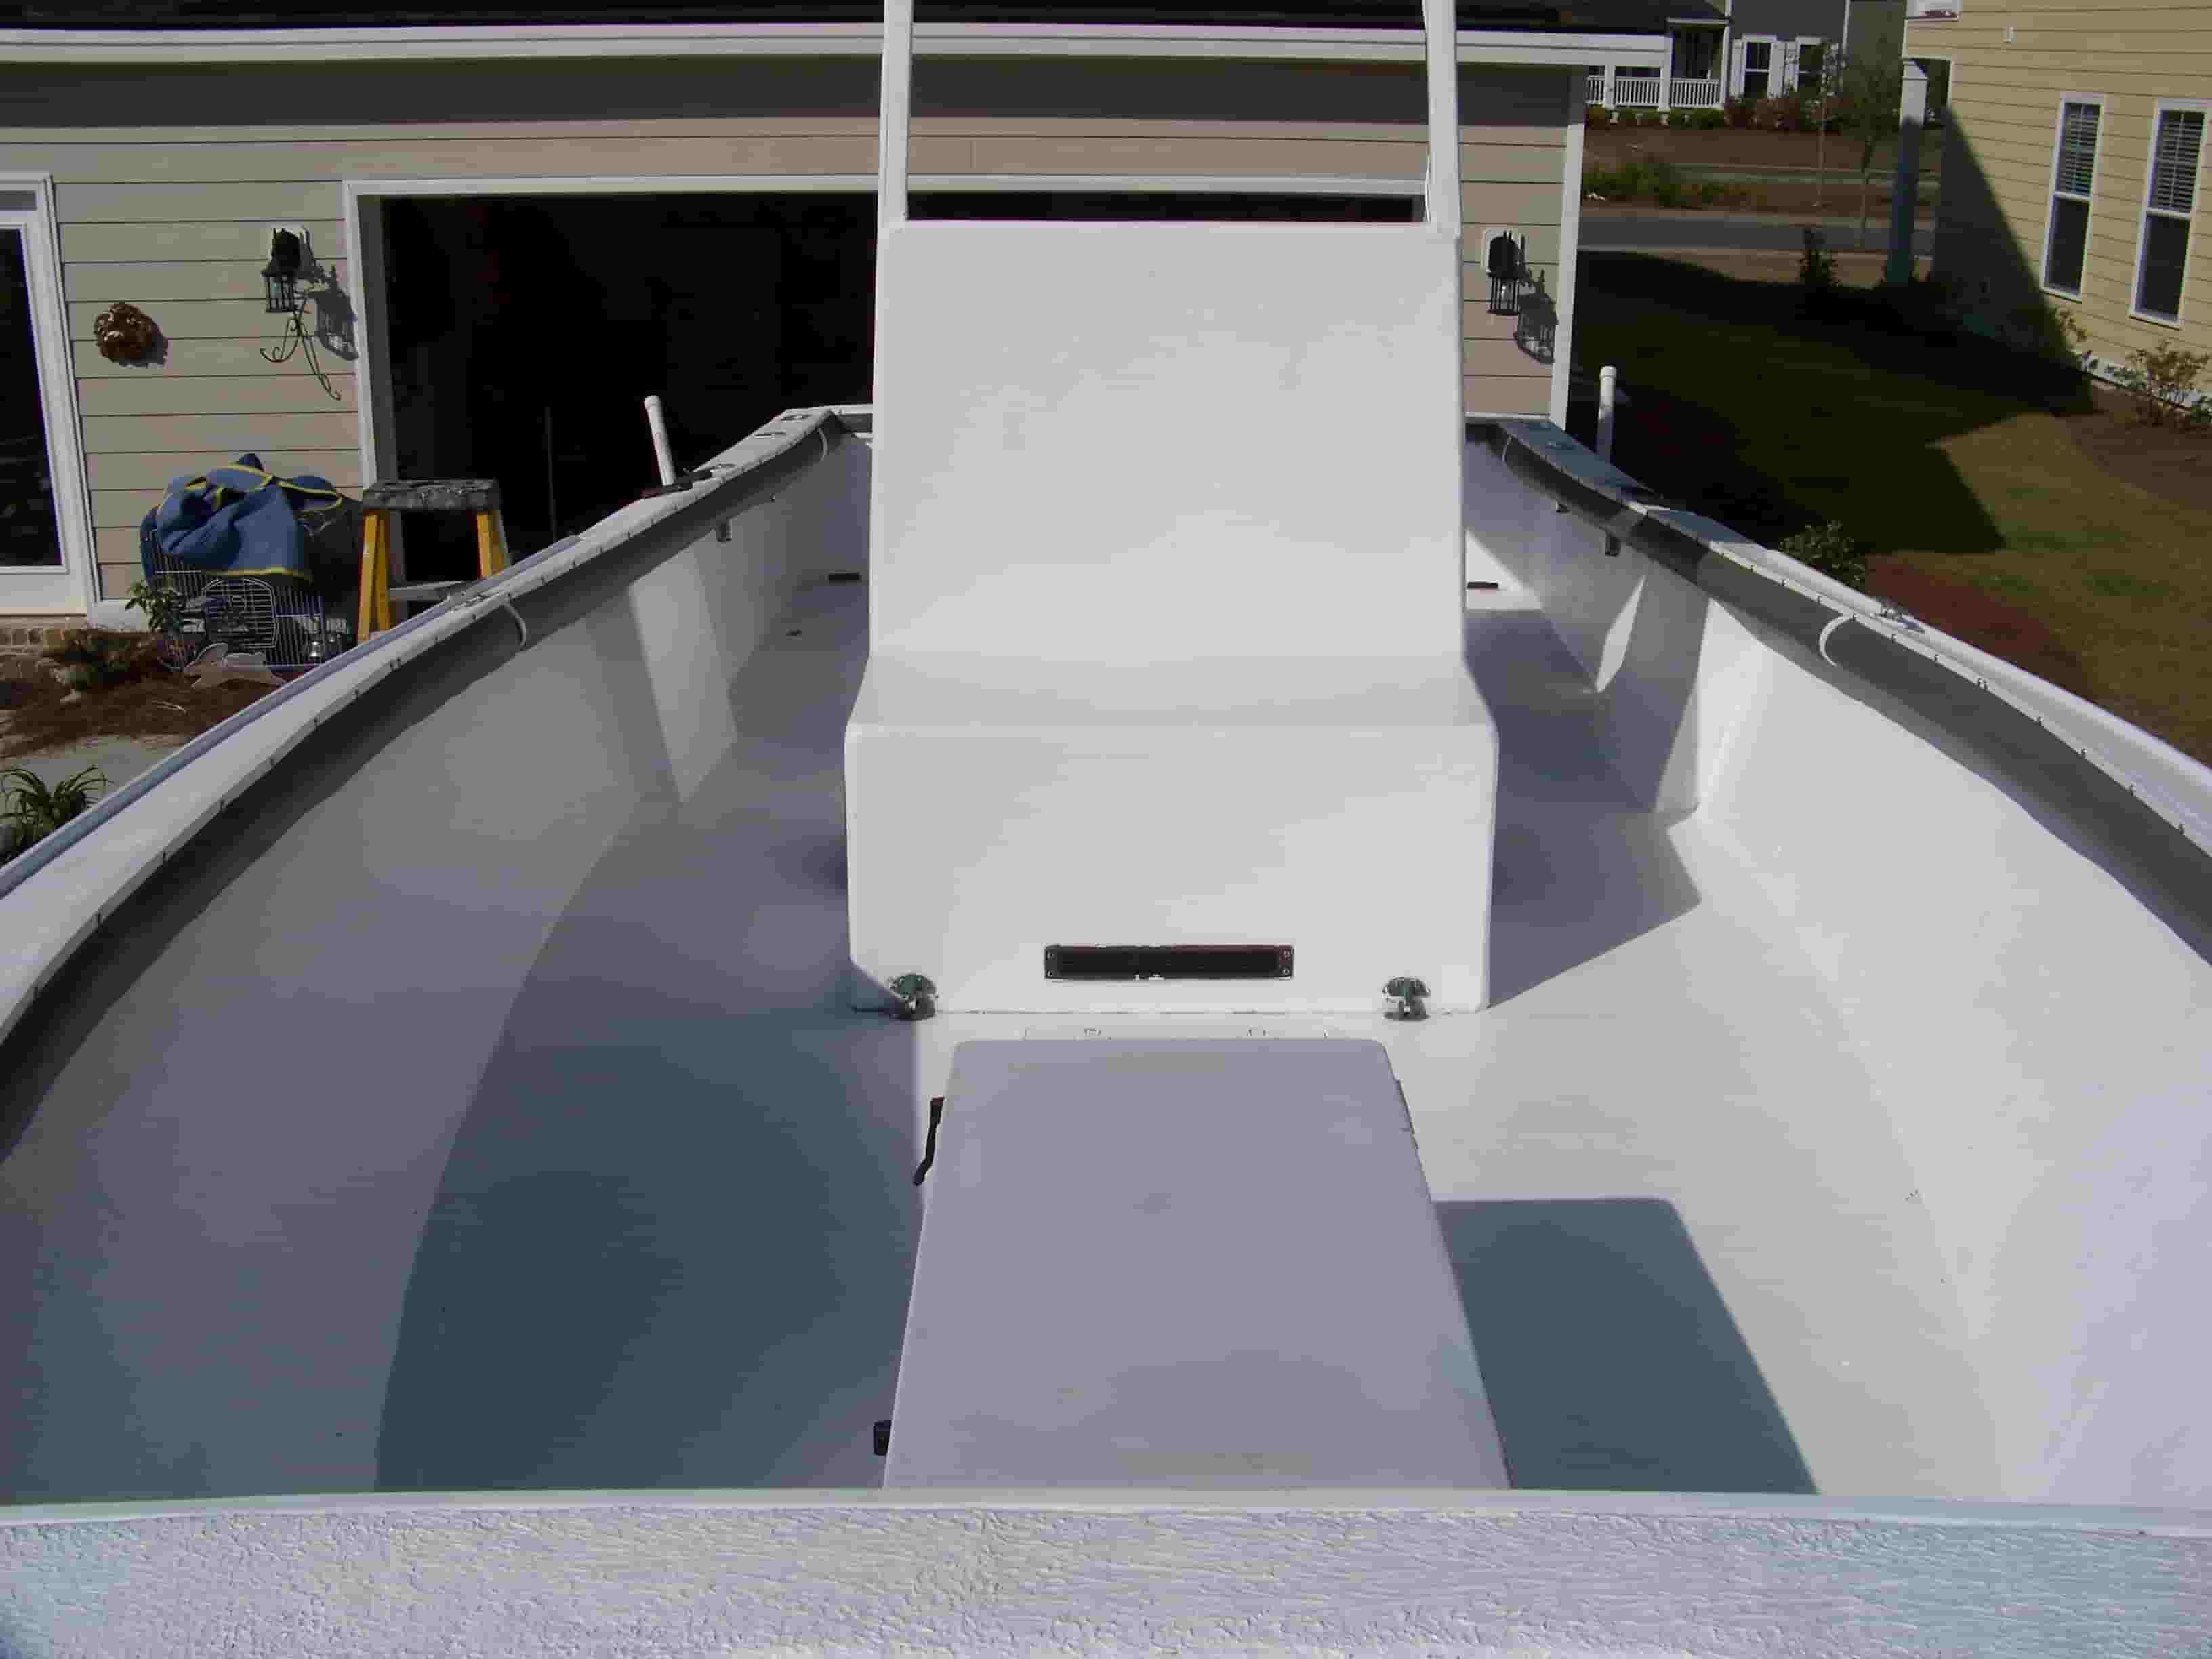 fiberglass boat deck cleaner